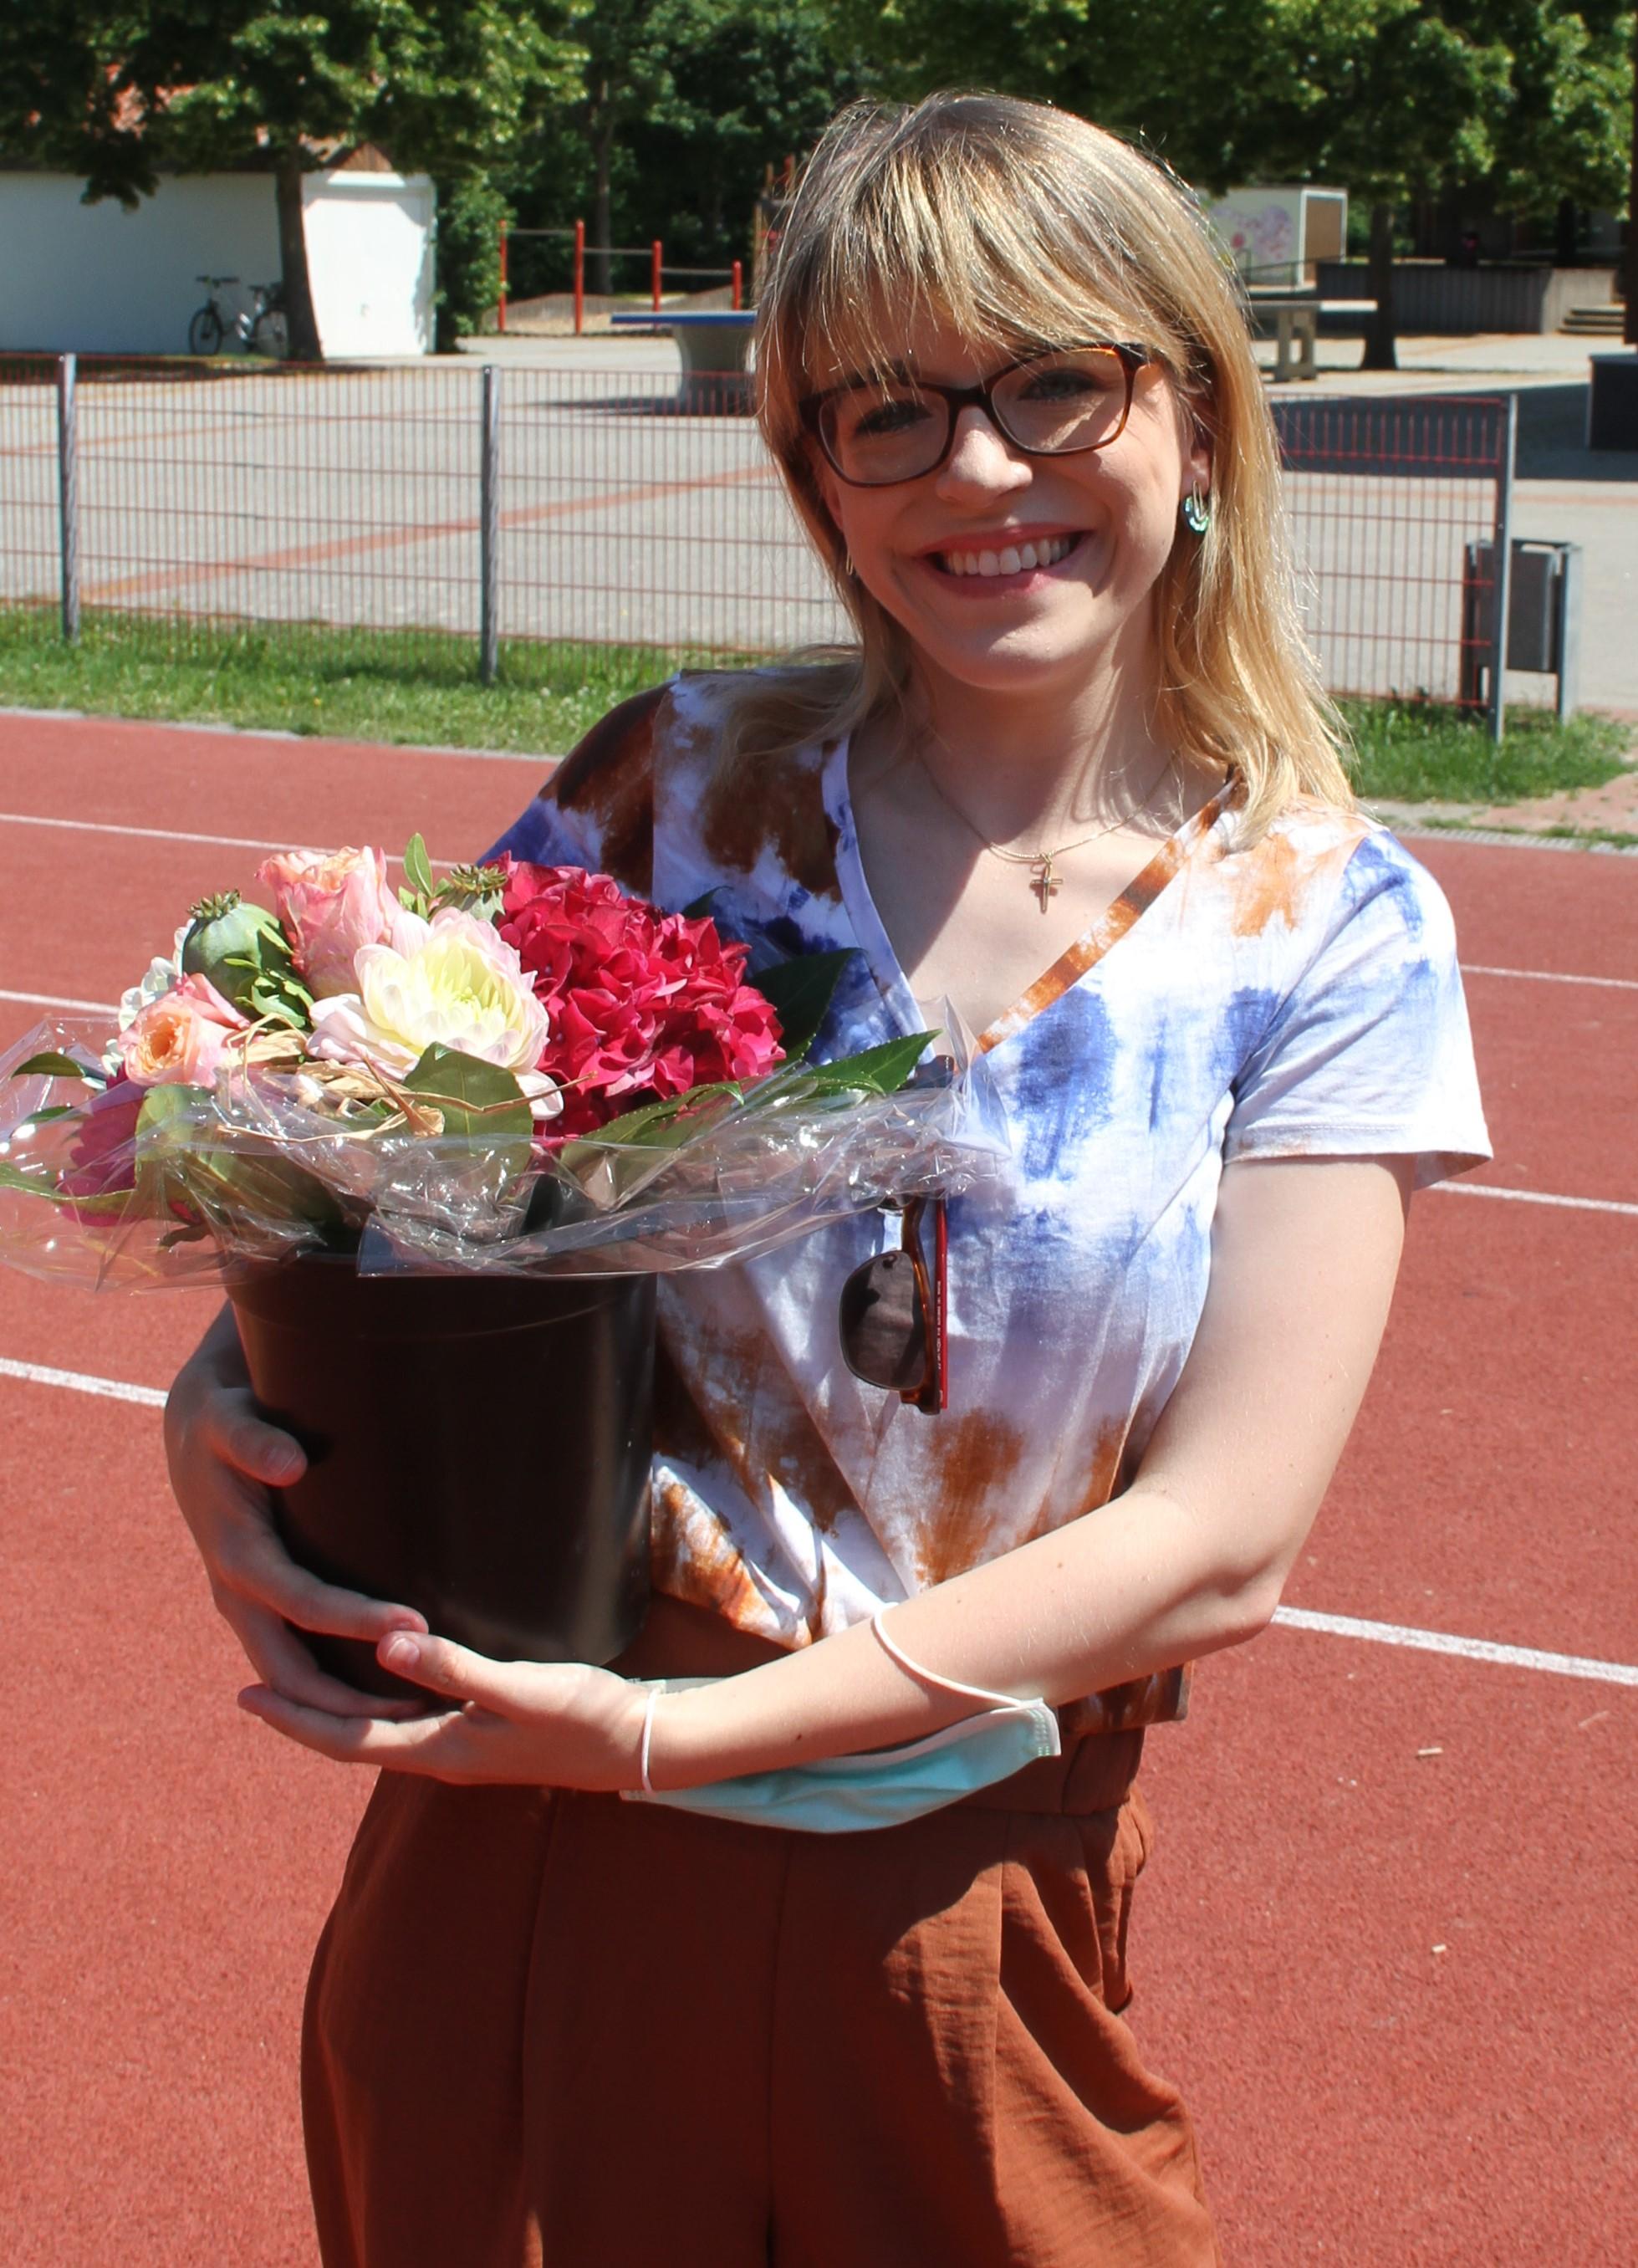 Verena Reusch